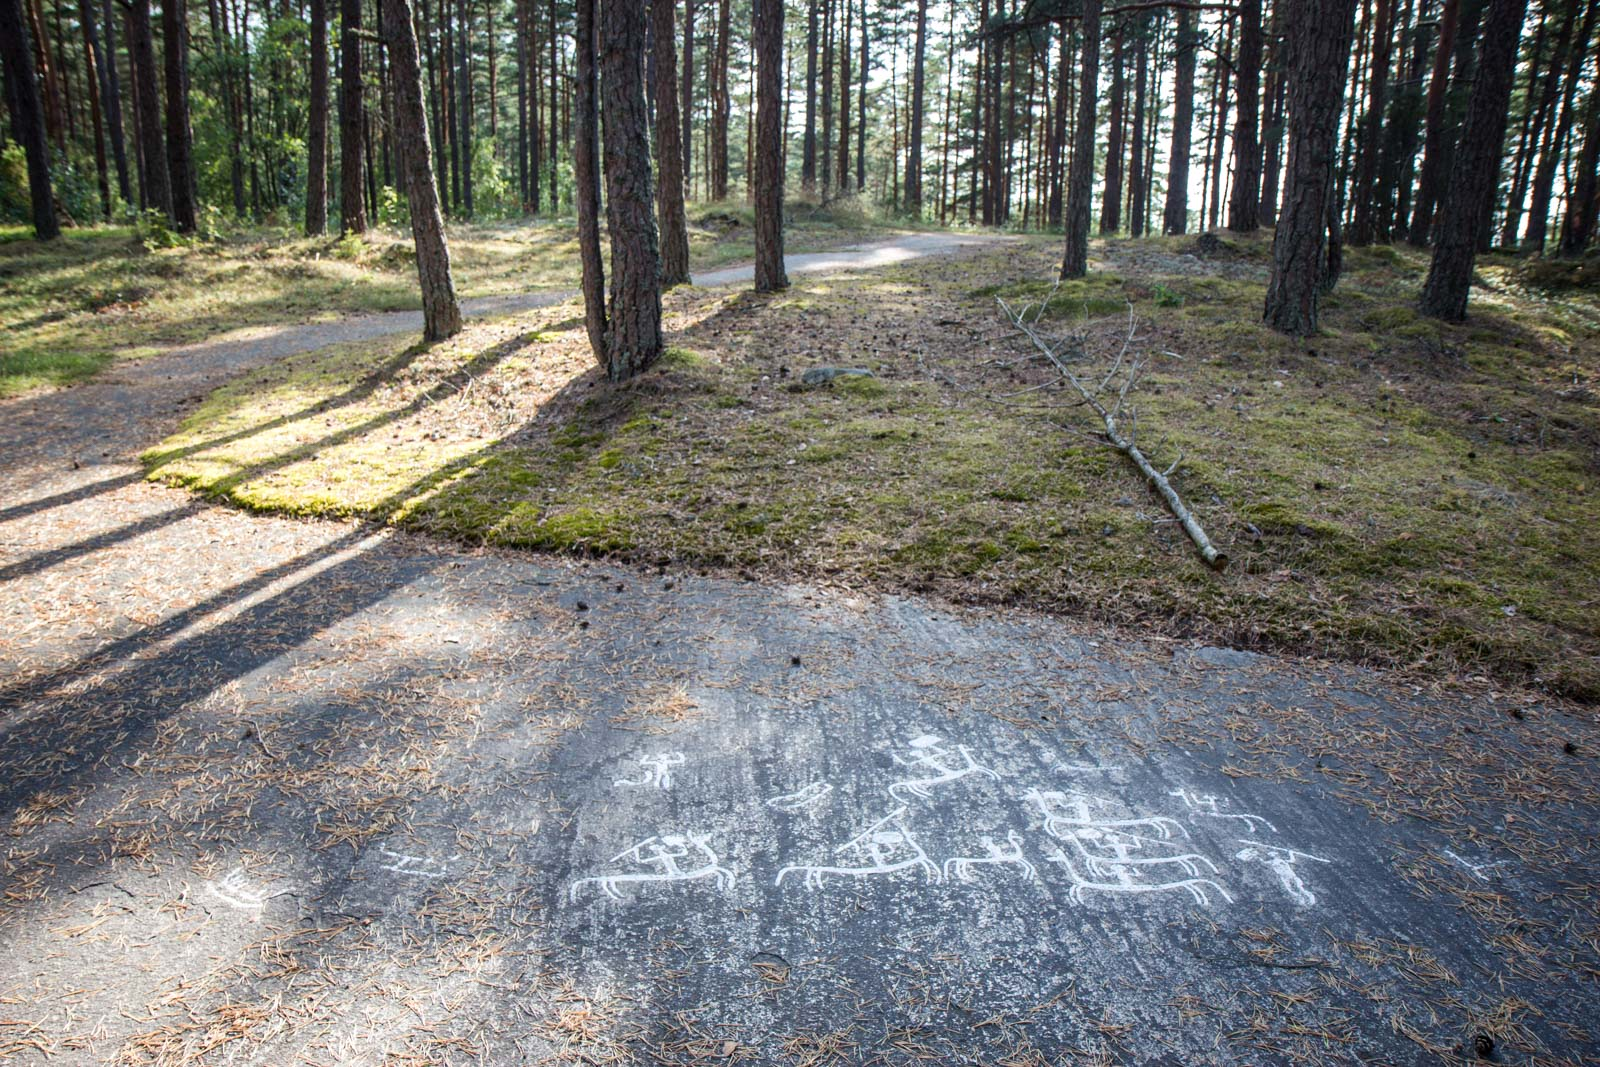 Tanum rock carvings, Bohuslän, Sweden